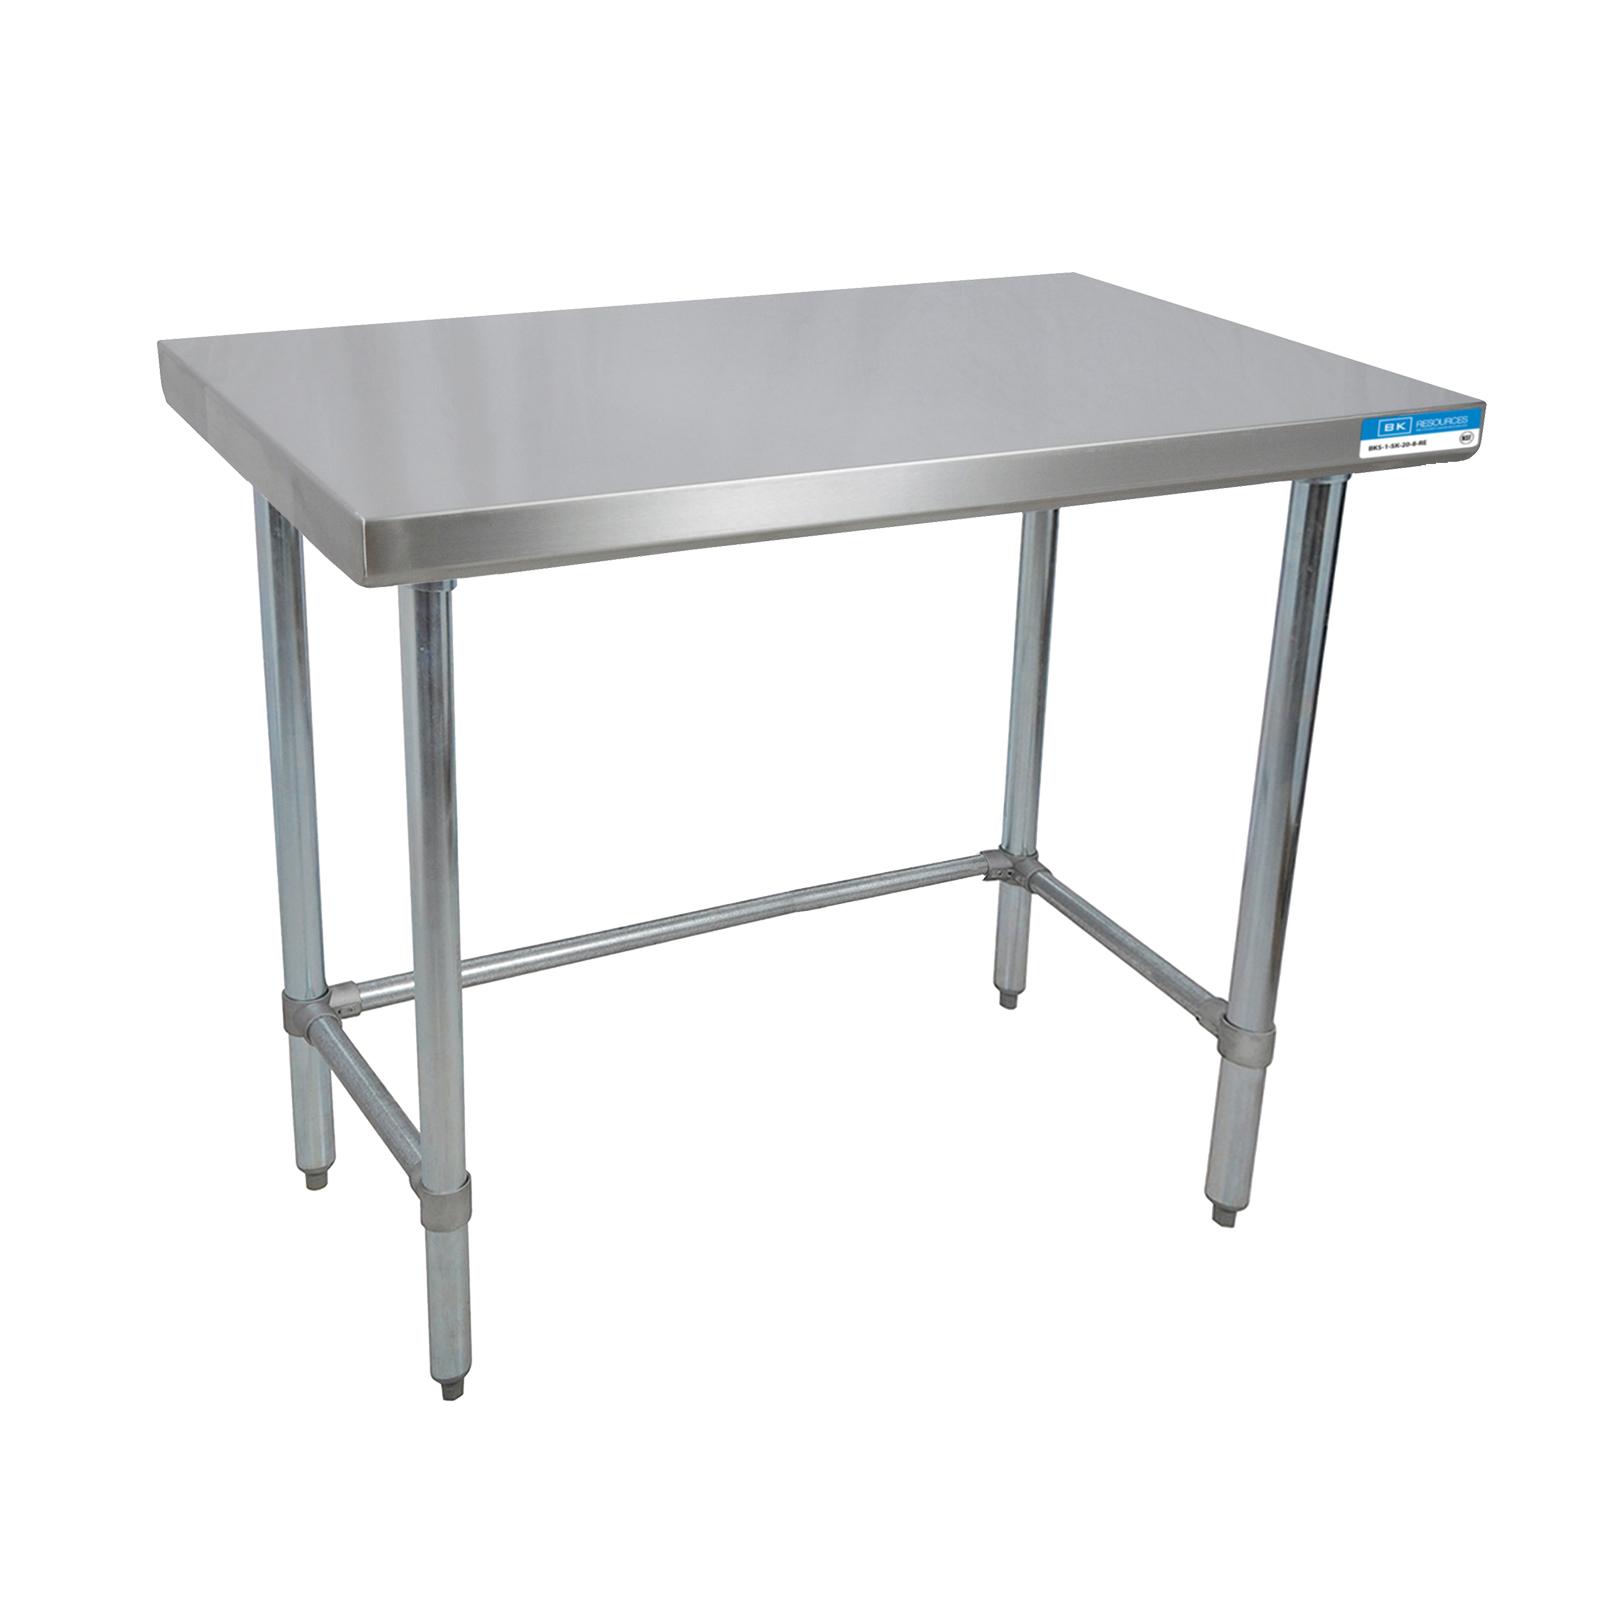 BK Resources VTTOB-1830 work table,  30